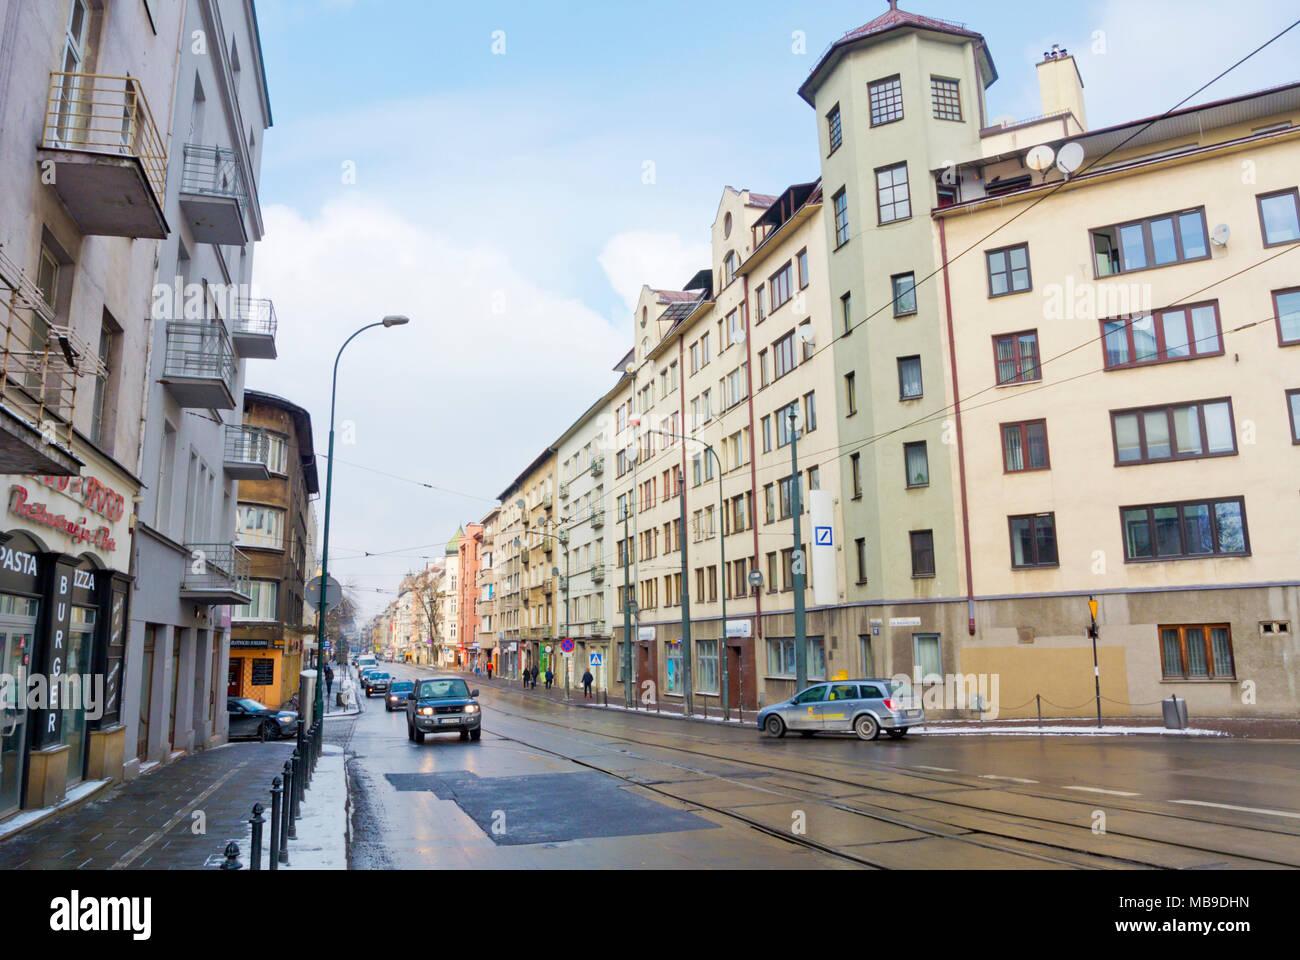 Starowislna, Krakow, Malopolska, Poland - Stock Image